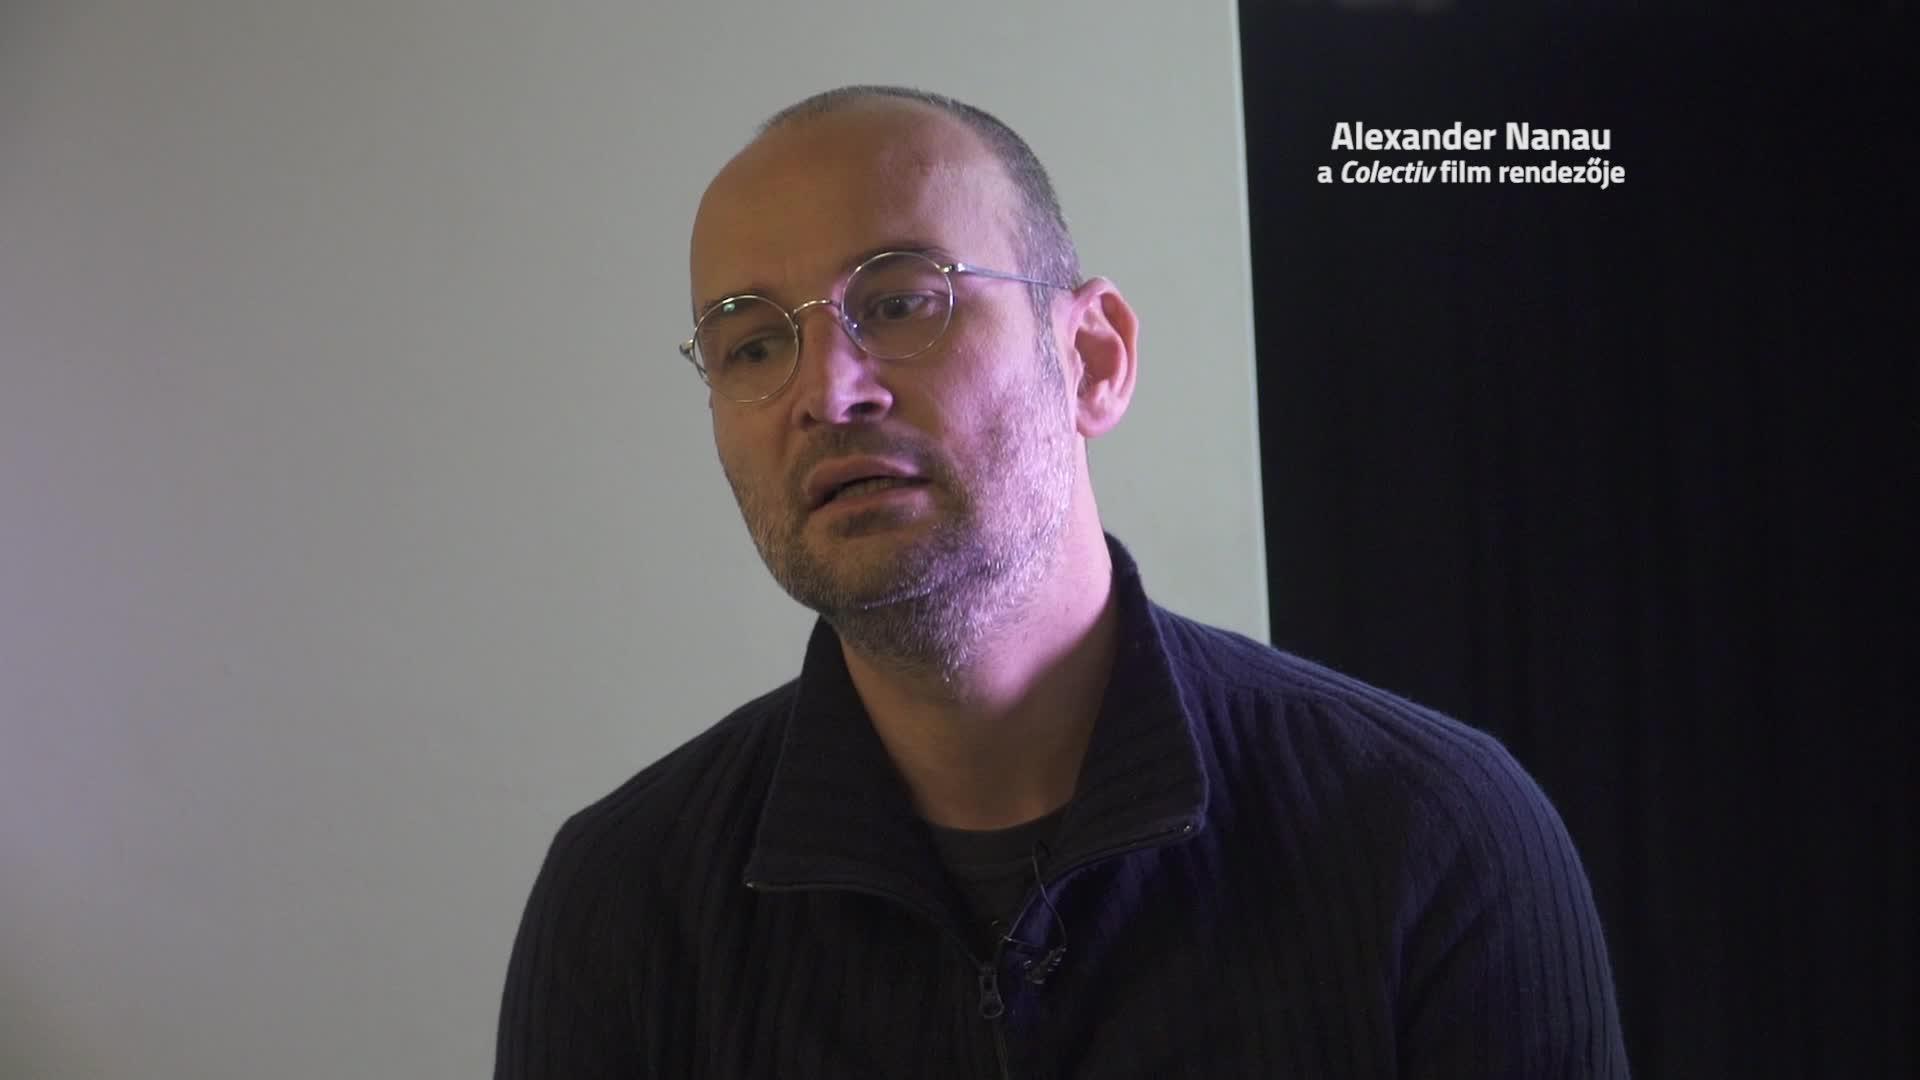 Alexander Nanau Interview